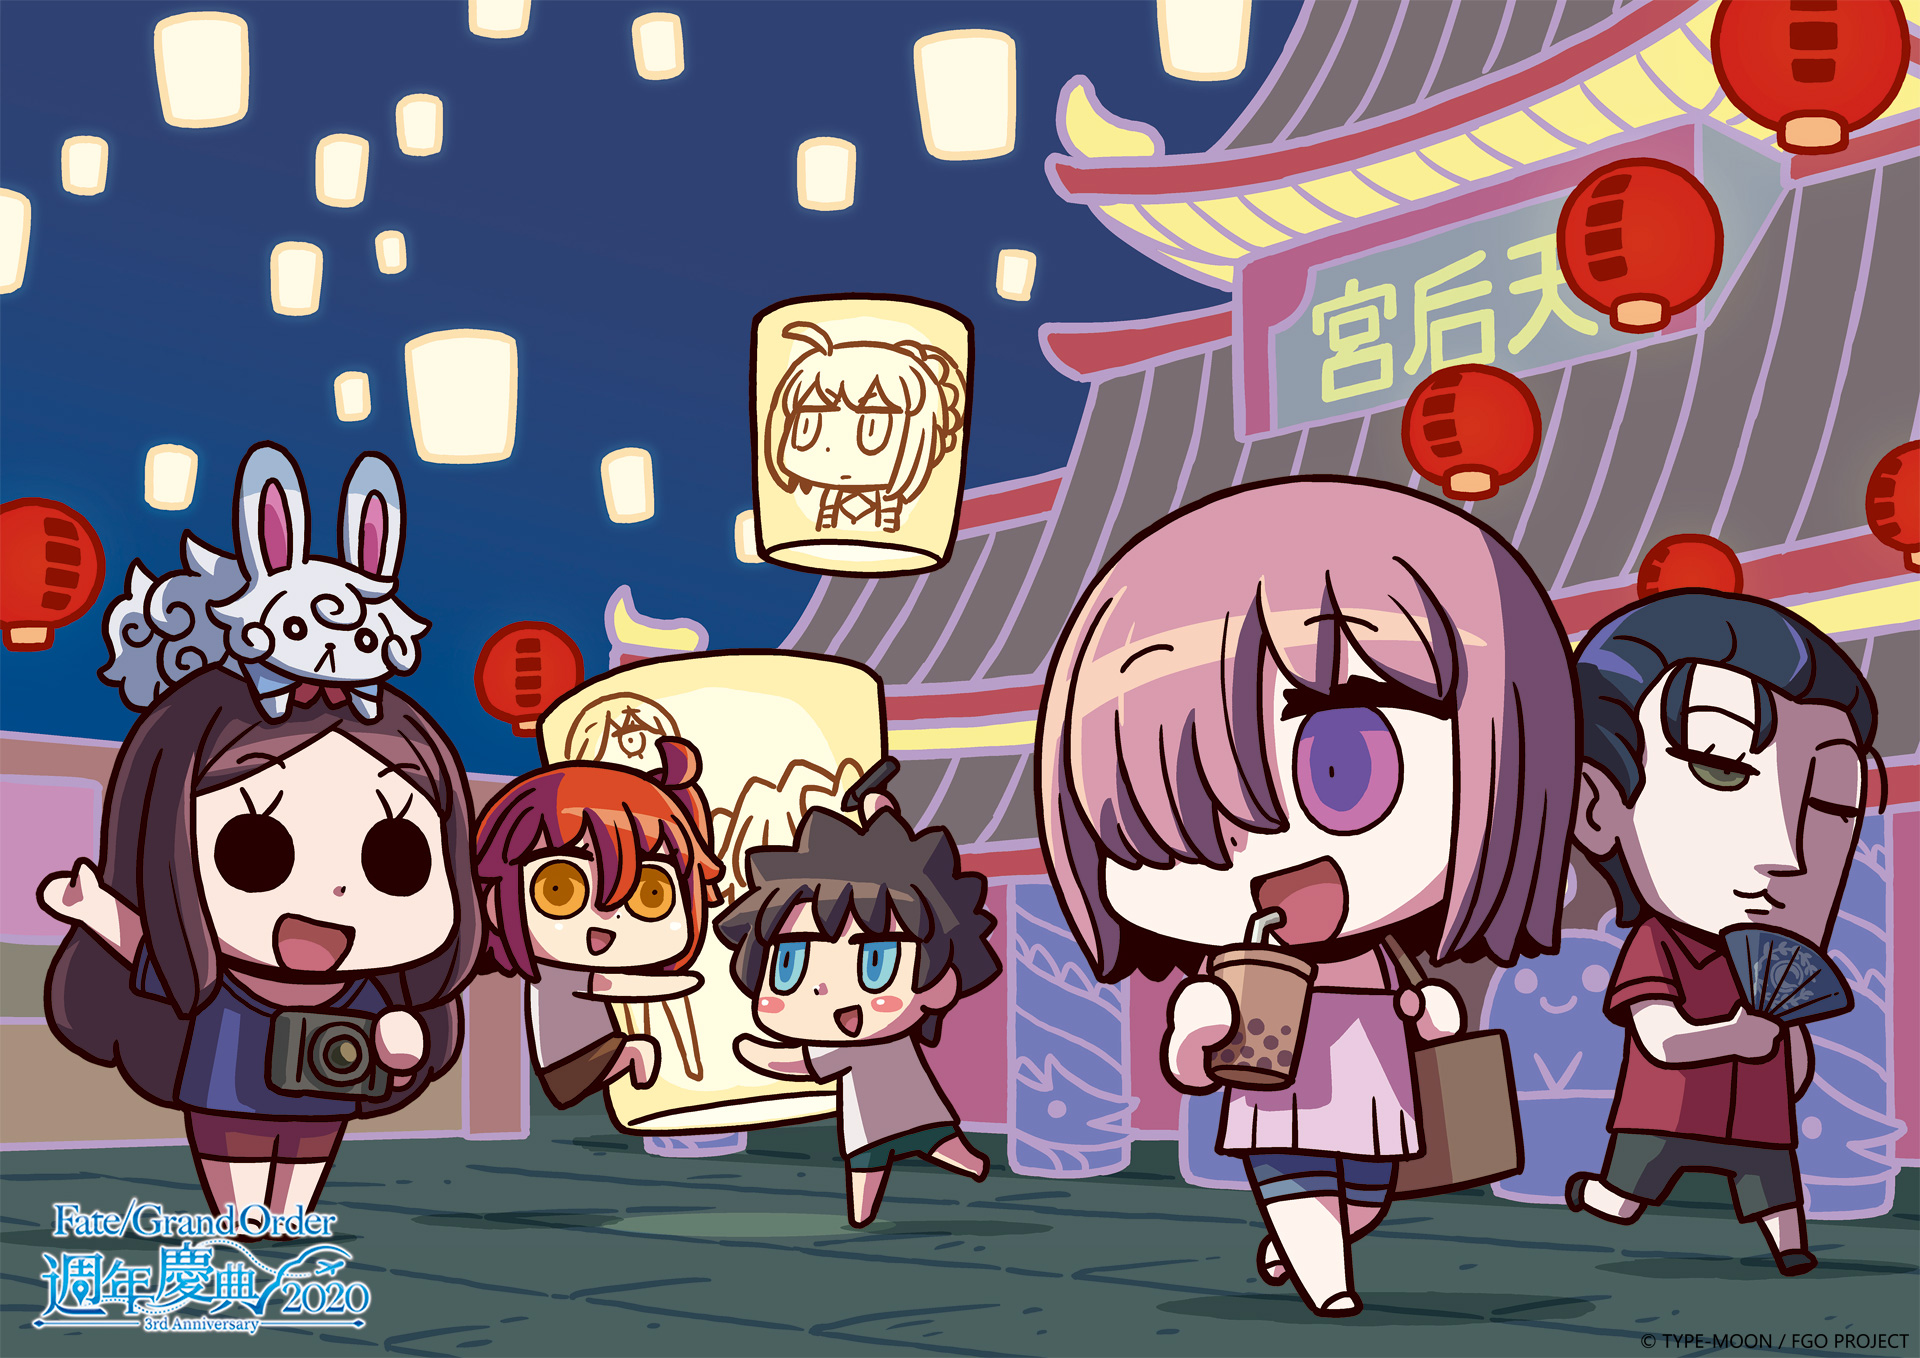 《Fate/Grand Order》繁中版歡慶三週年, 慶生系列活動、繁中版三週年慶典活動視覺,5/11搶先公開!